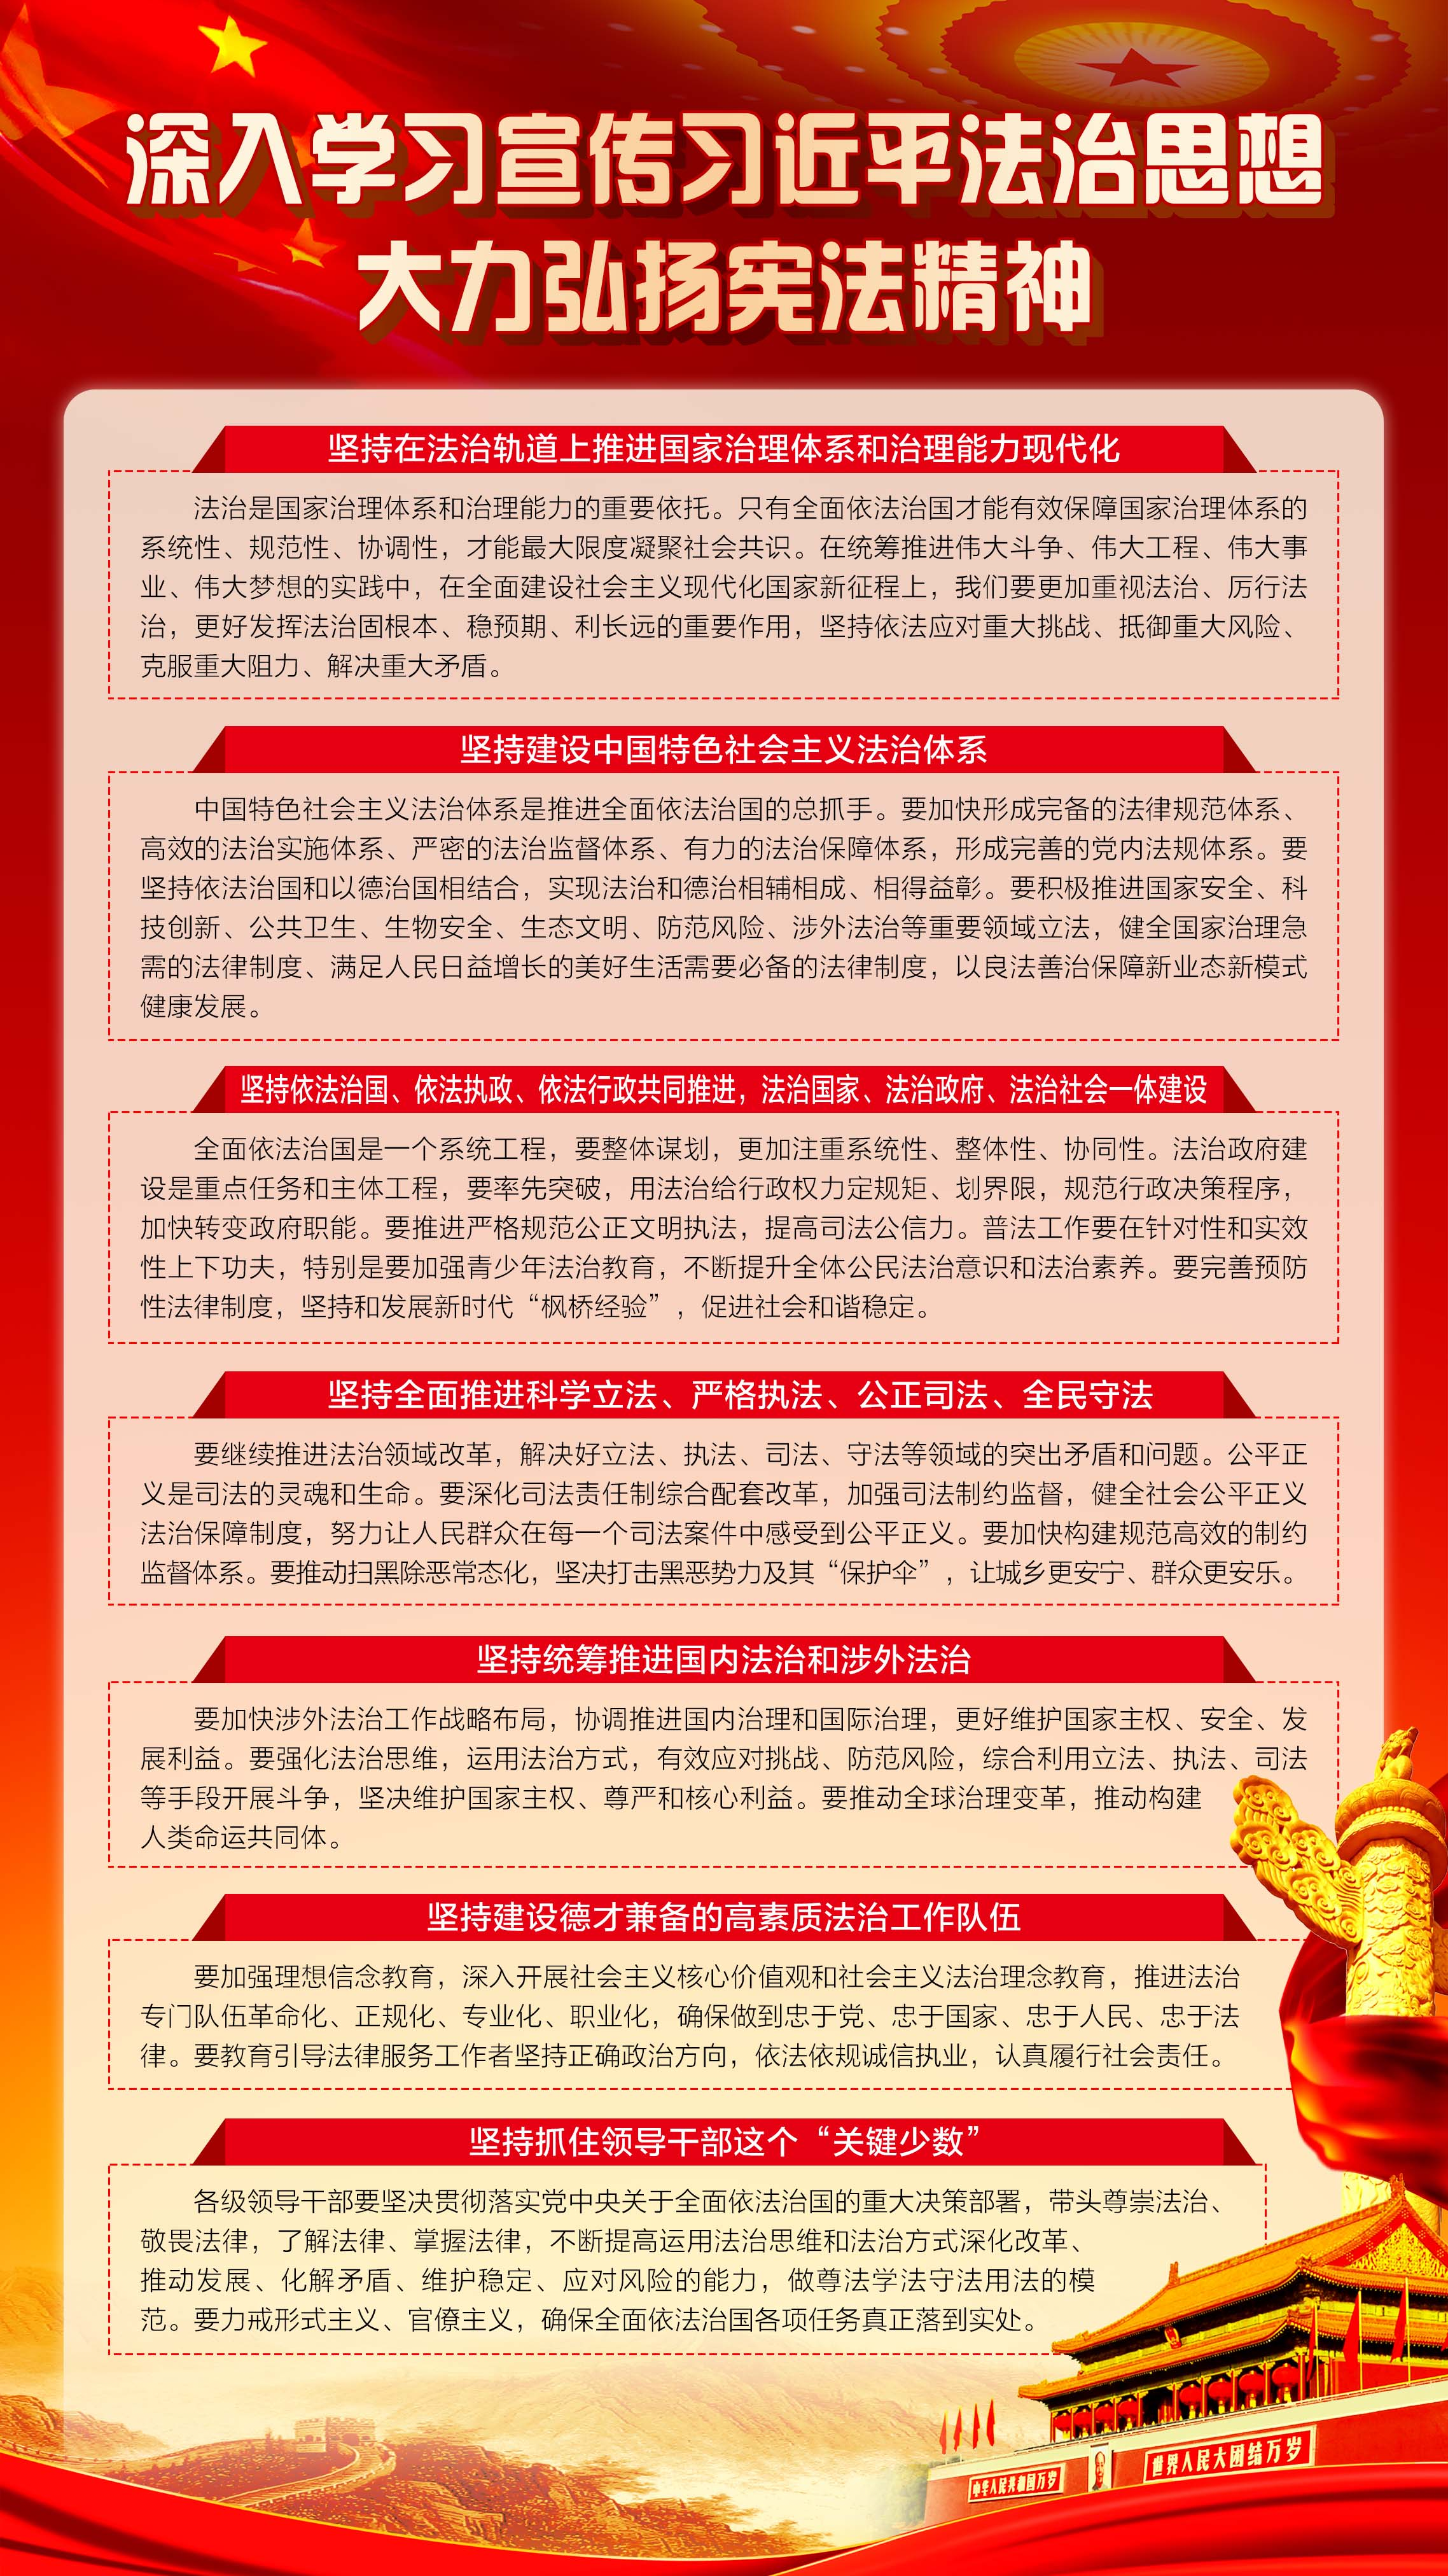 beplay体育下载安卓版|推荐进入国家宪法日宣传